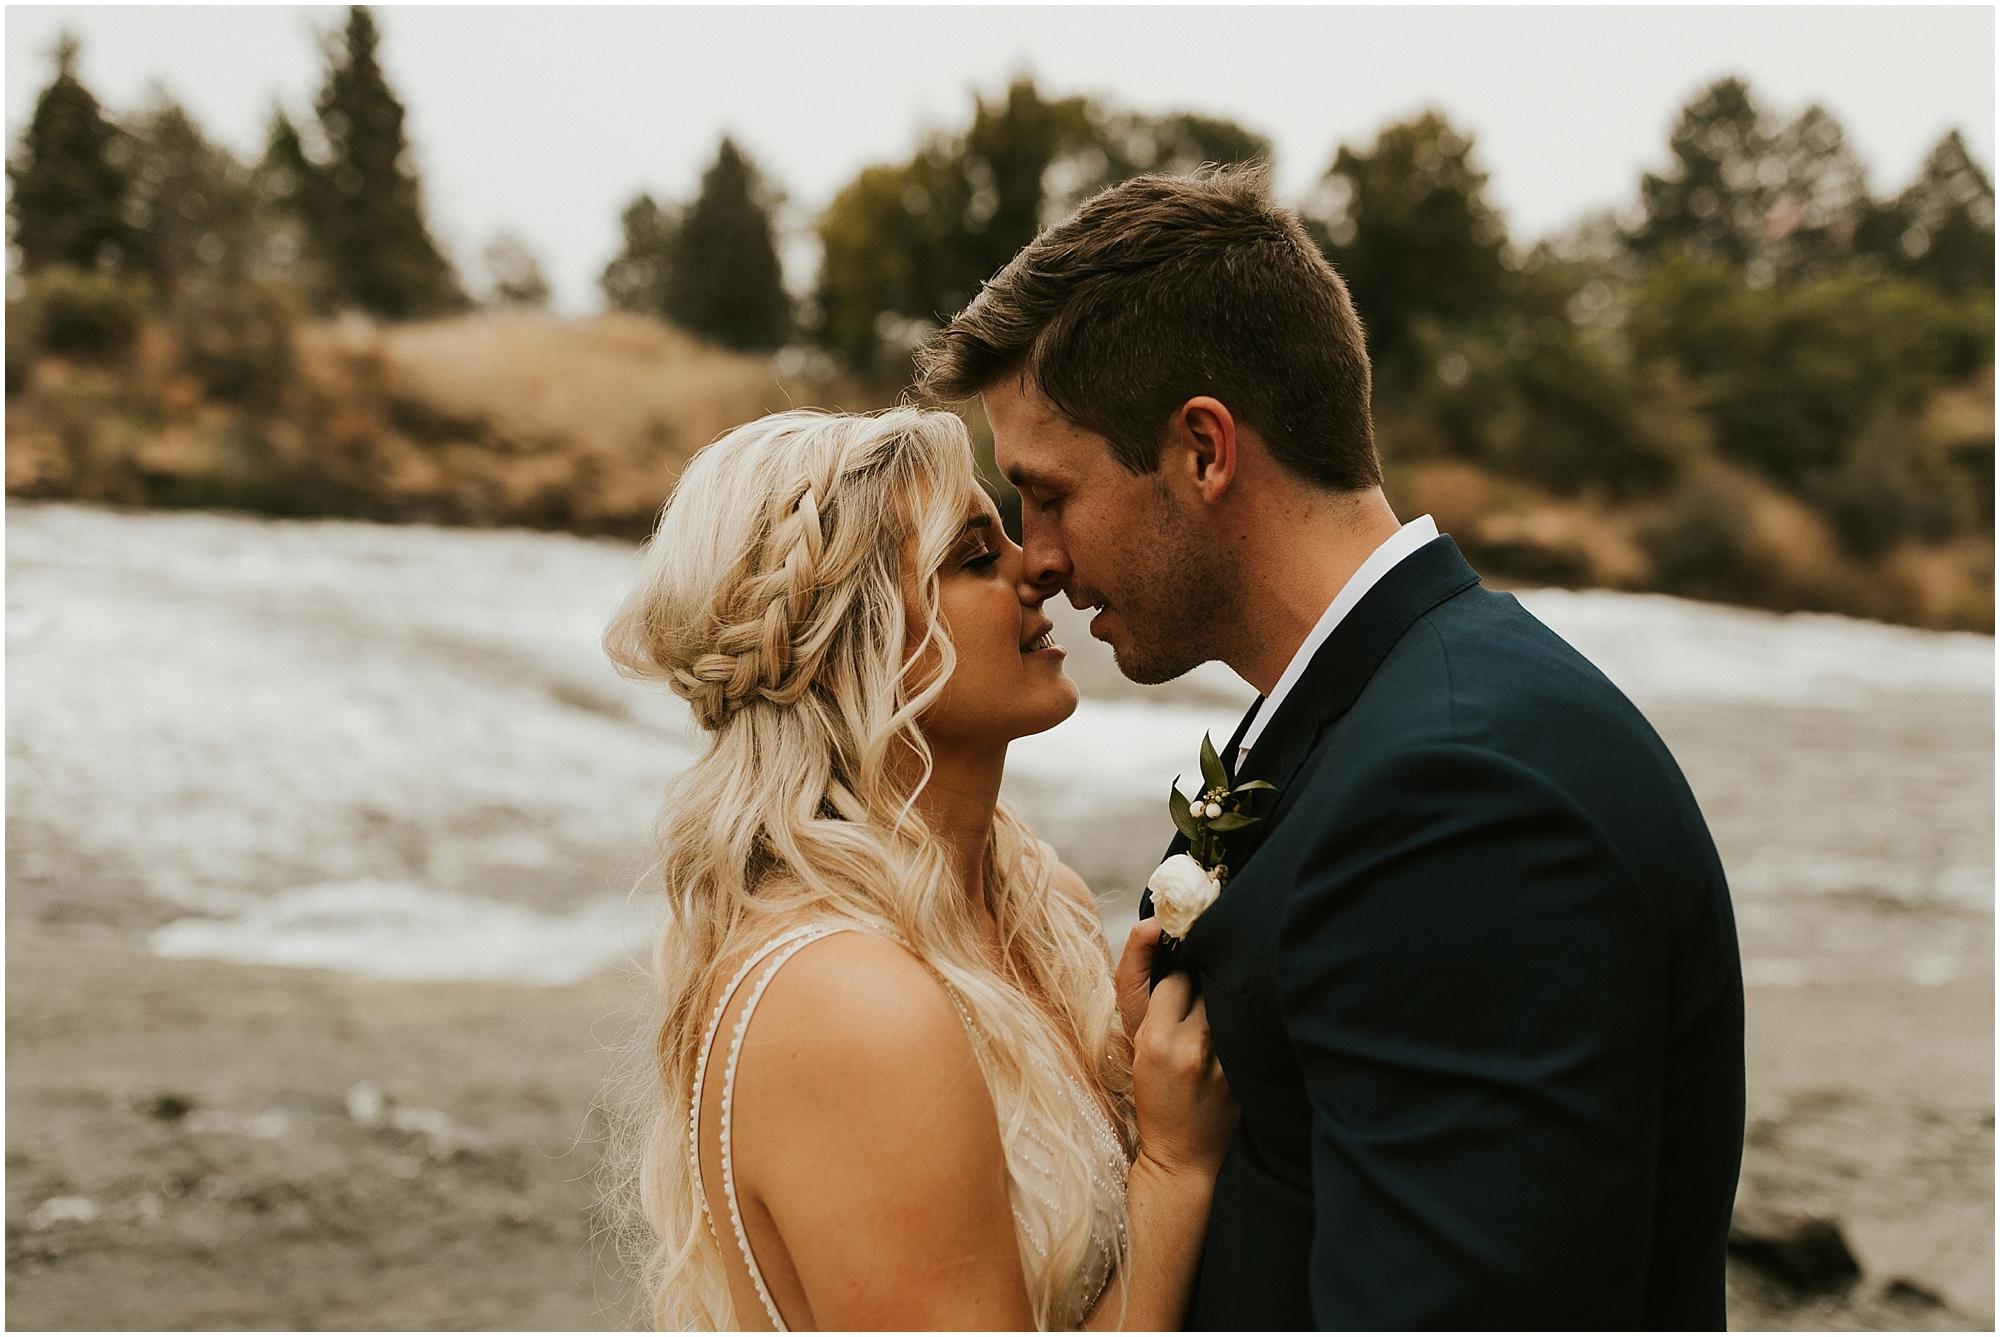 Chateau Rive Spokane Wedding Cassie Trottier Photography1109.jpg